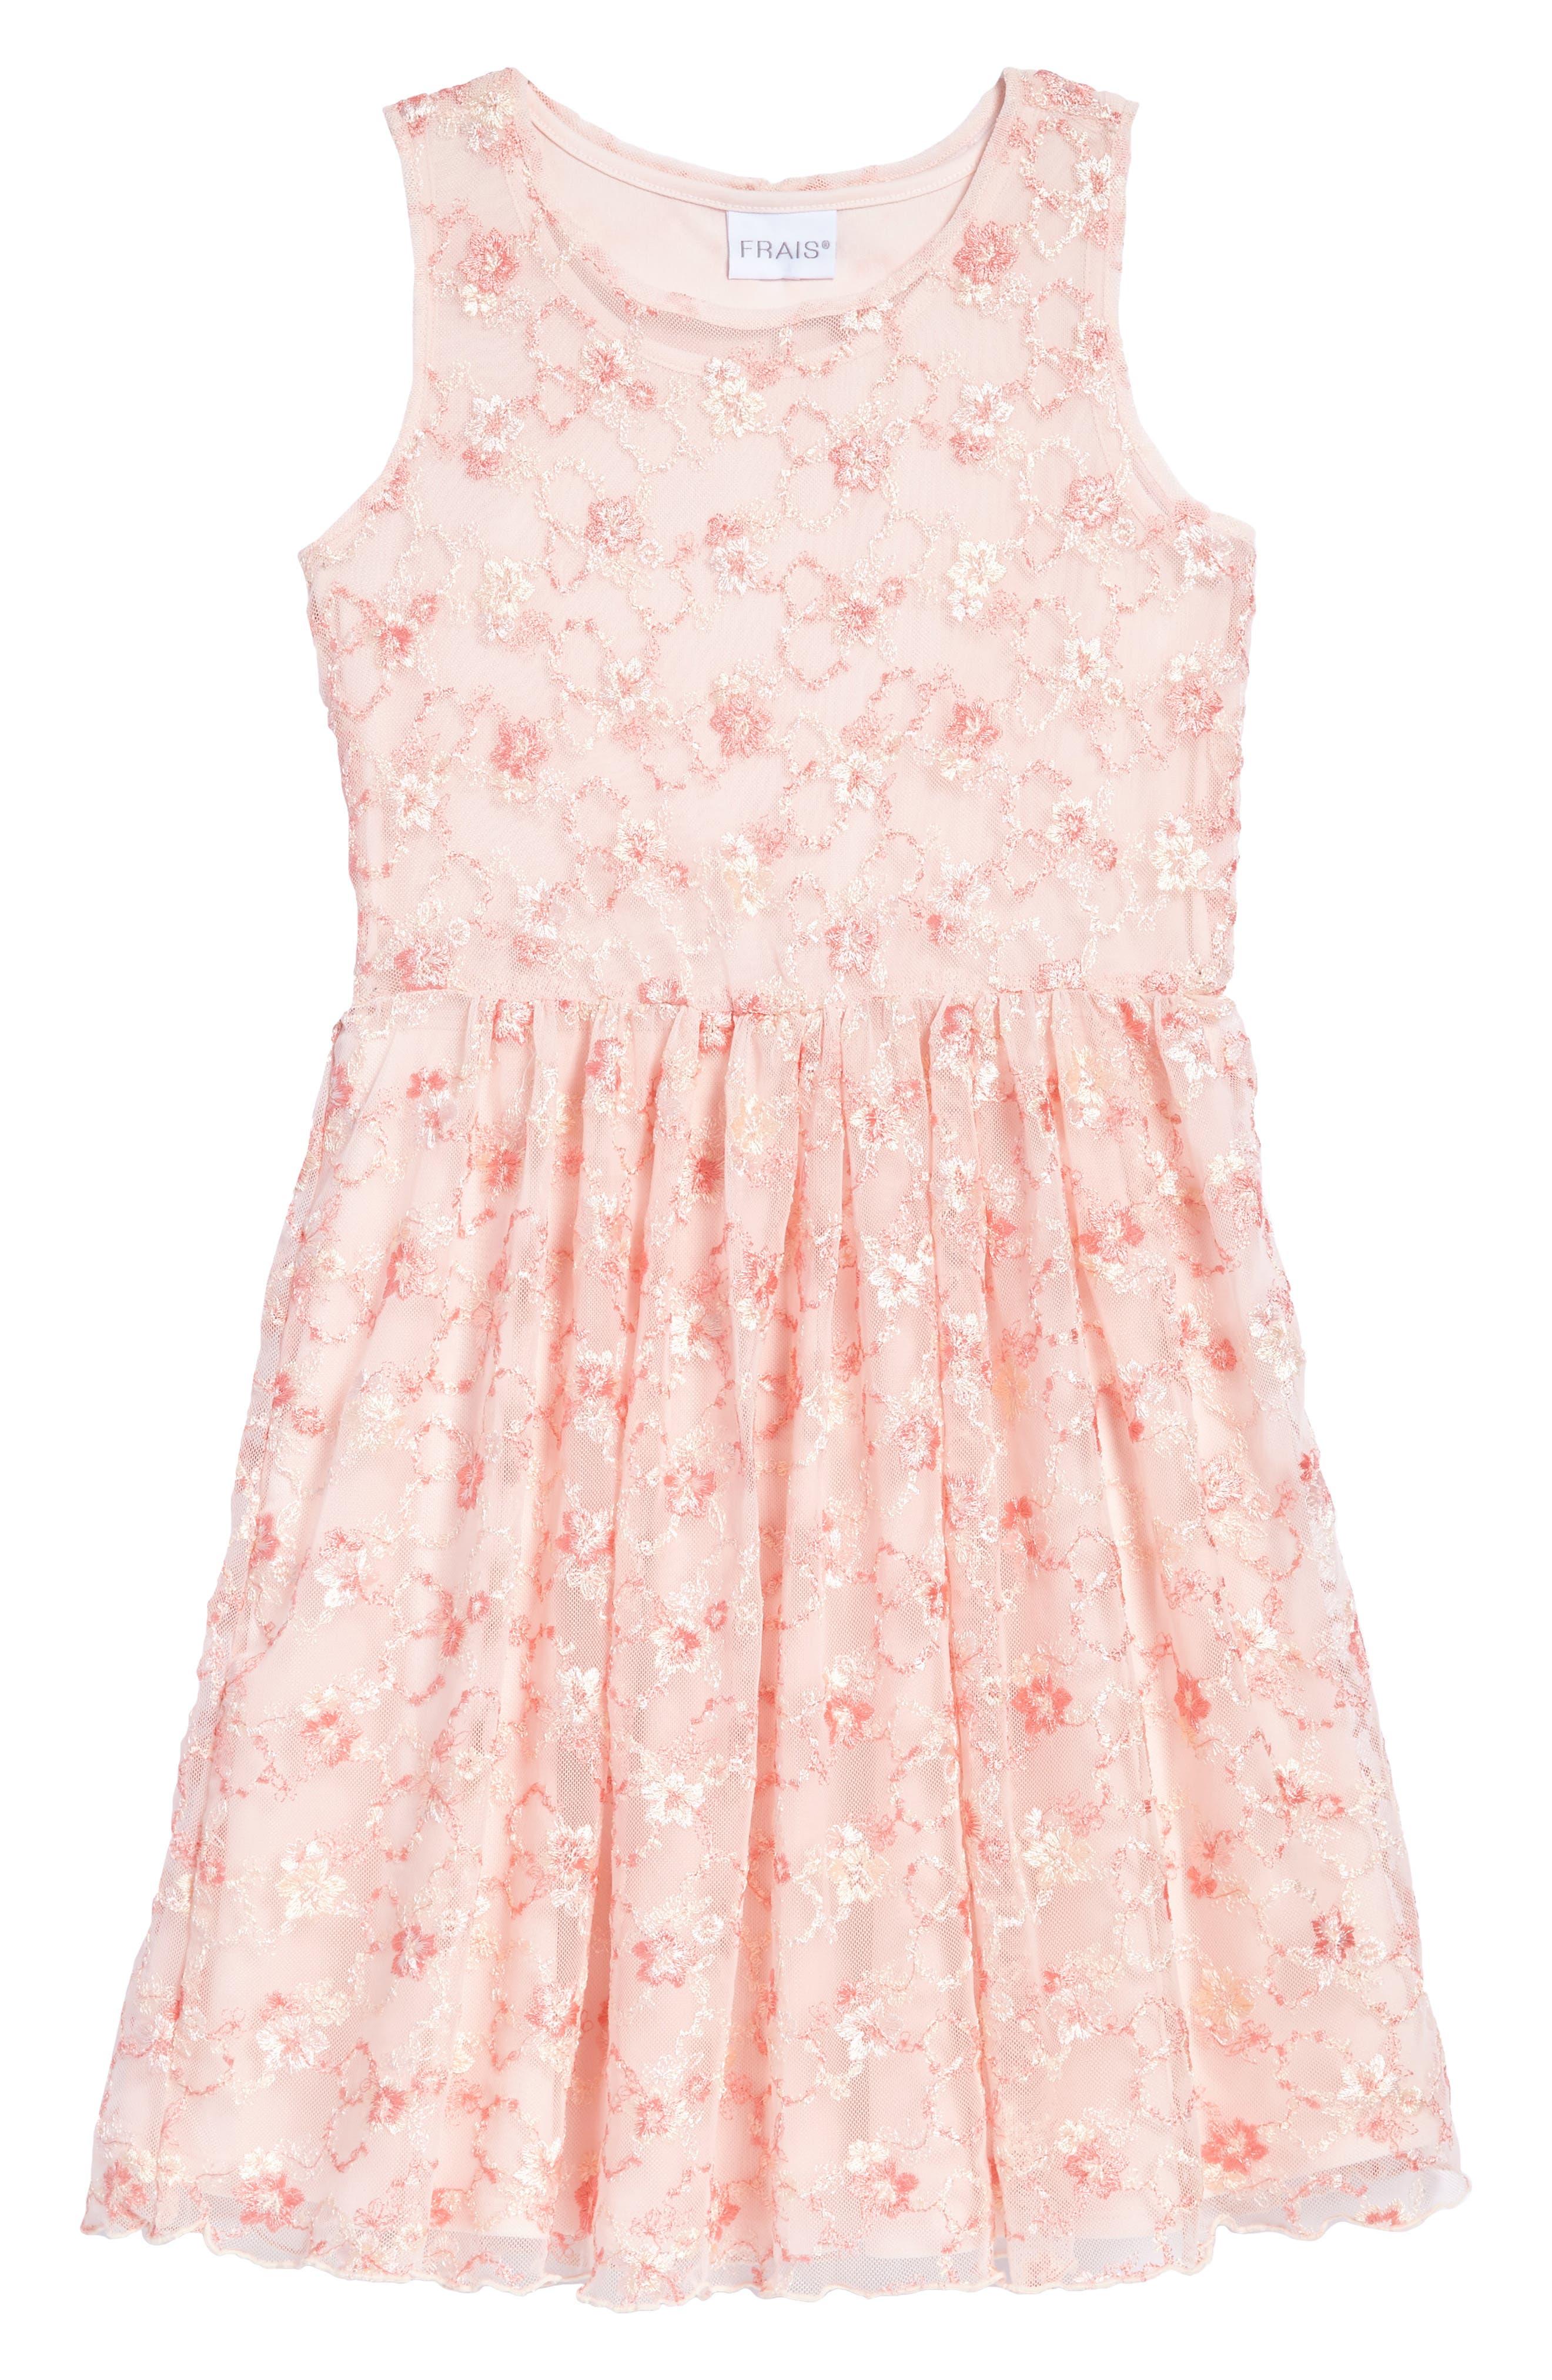 Main Image - Frais Floral Embroidered Tulle Dress (Toddler Girls, Little Girls & Big Girls)